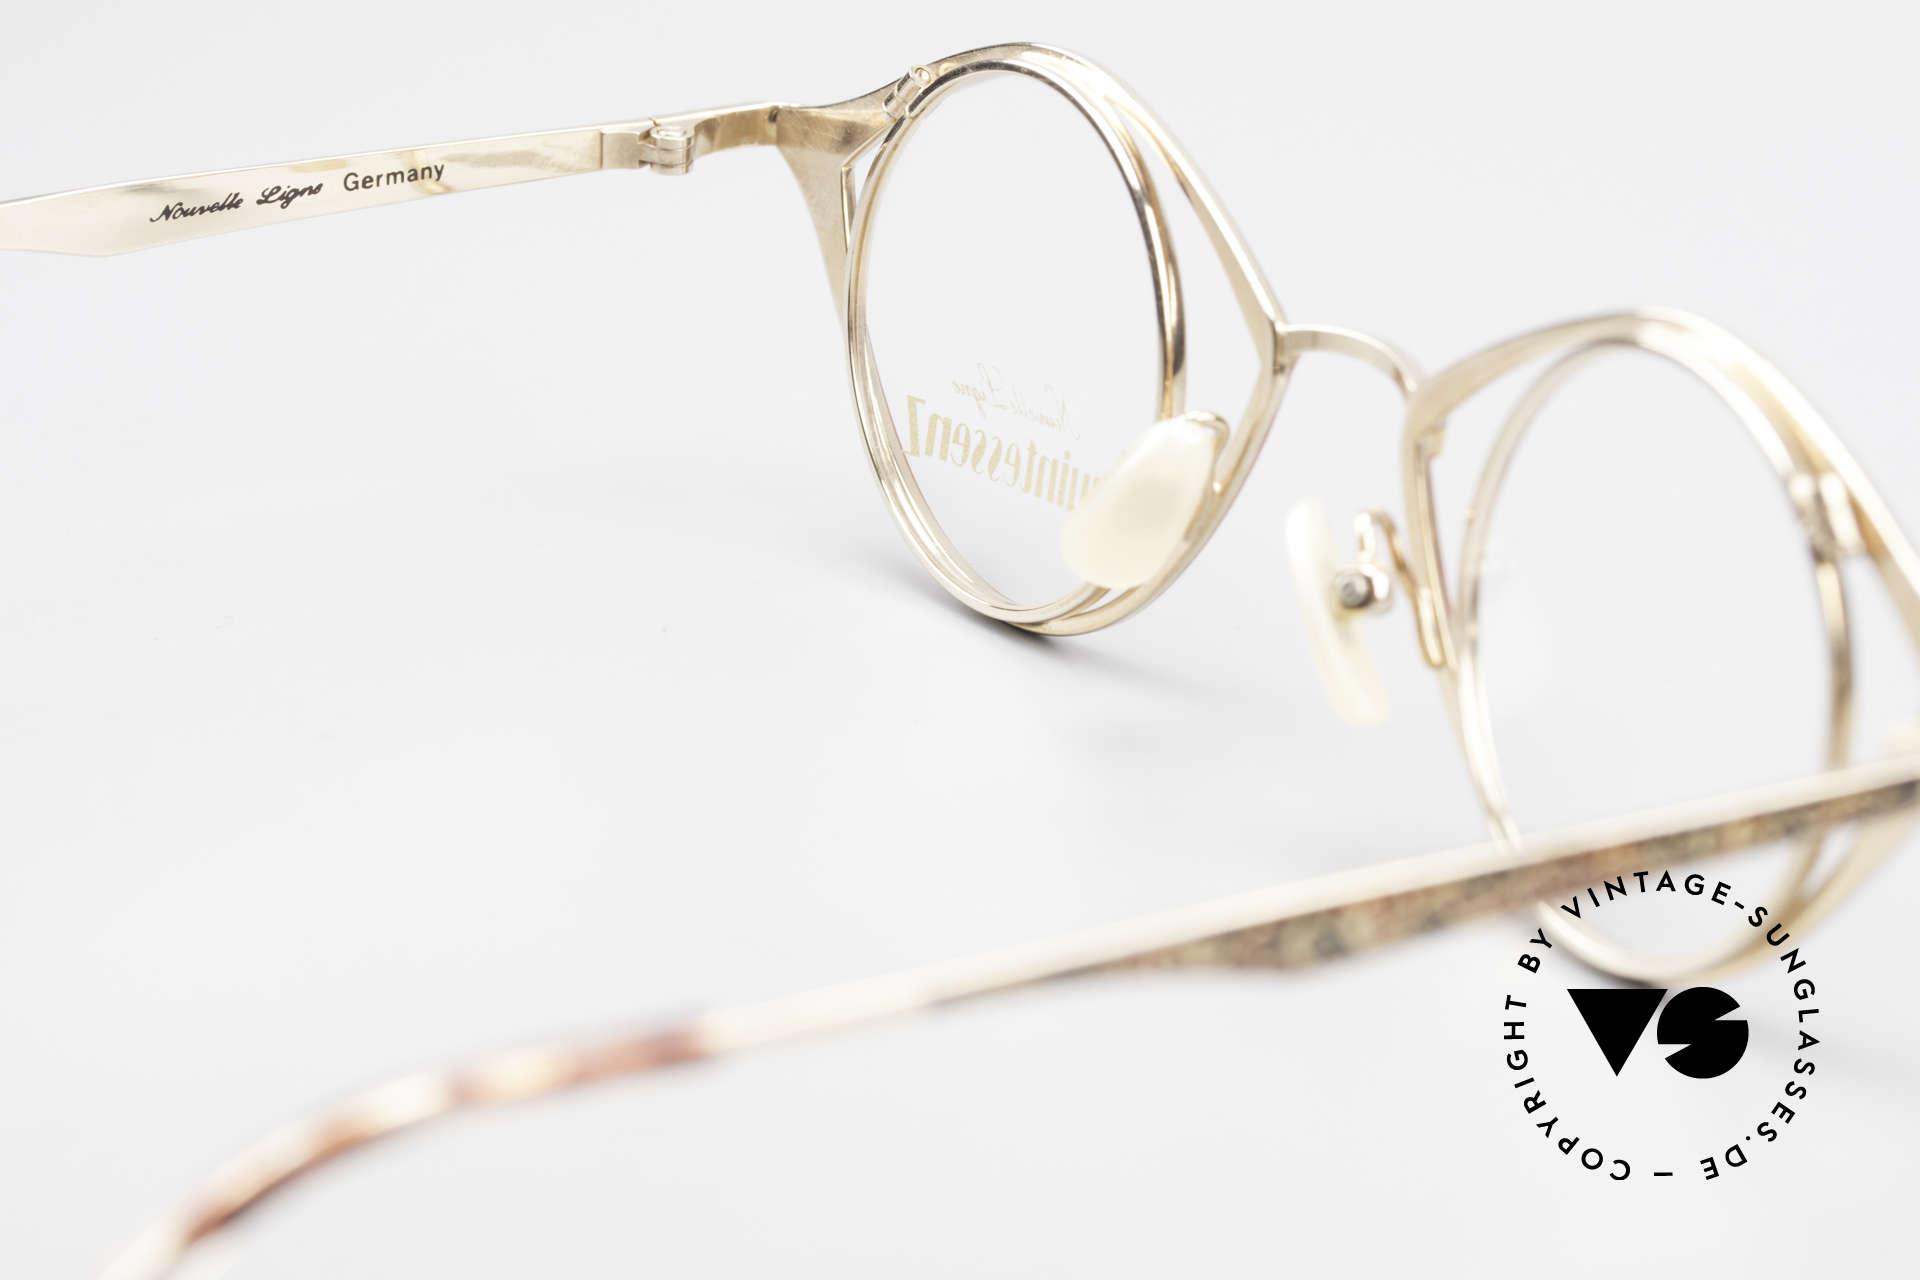 Nouvelle Ligne Q40 Vintage Damenbrille No Retro, Größe: large, Passend für Damen